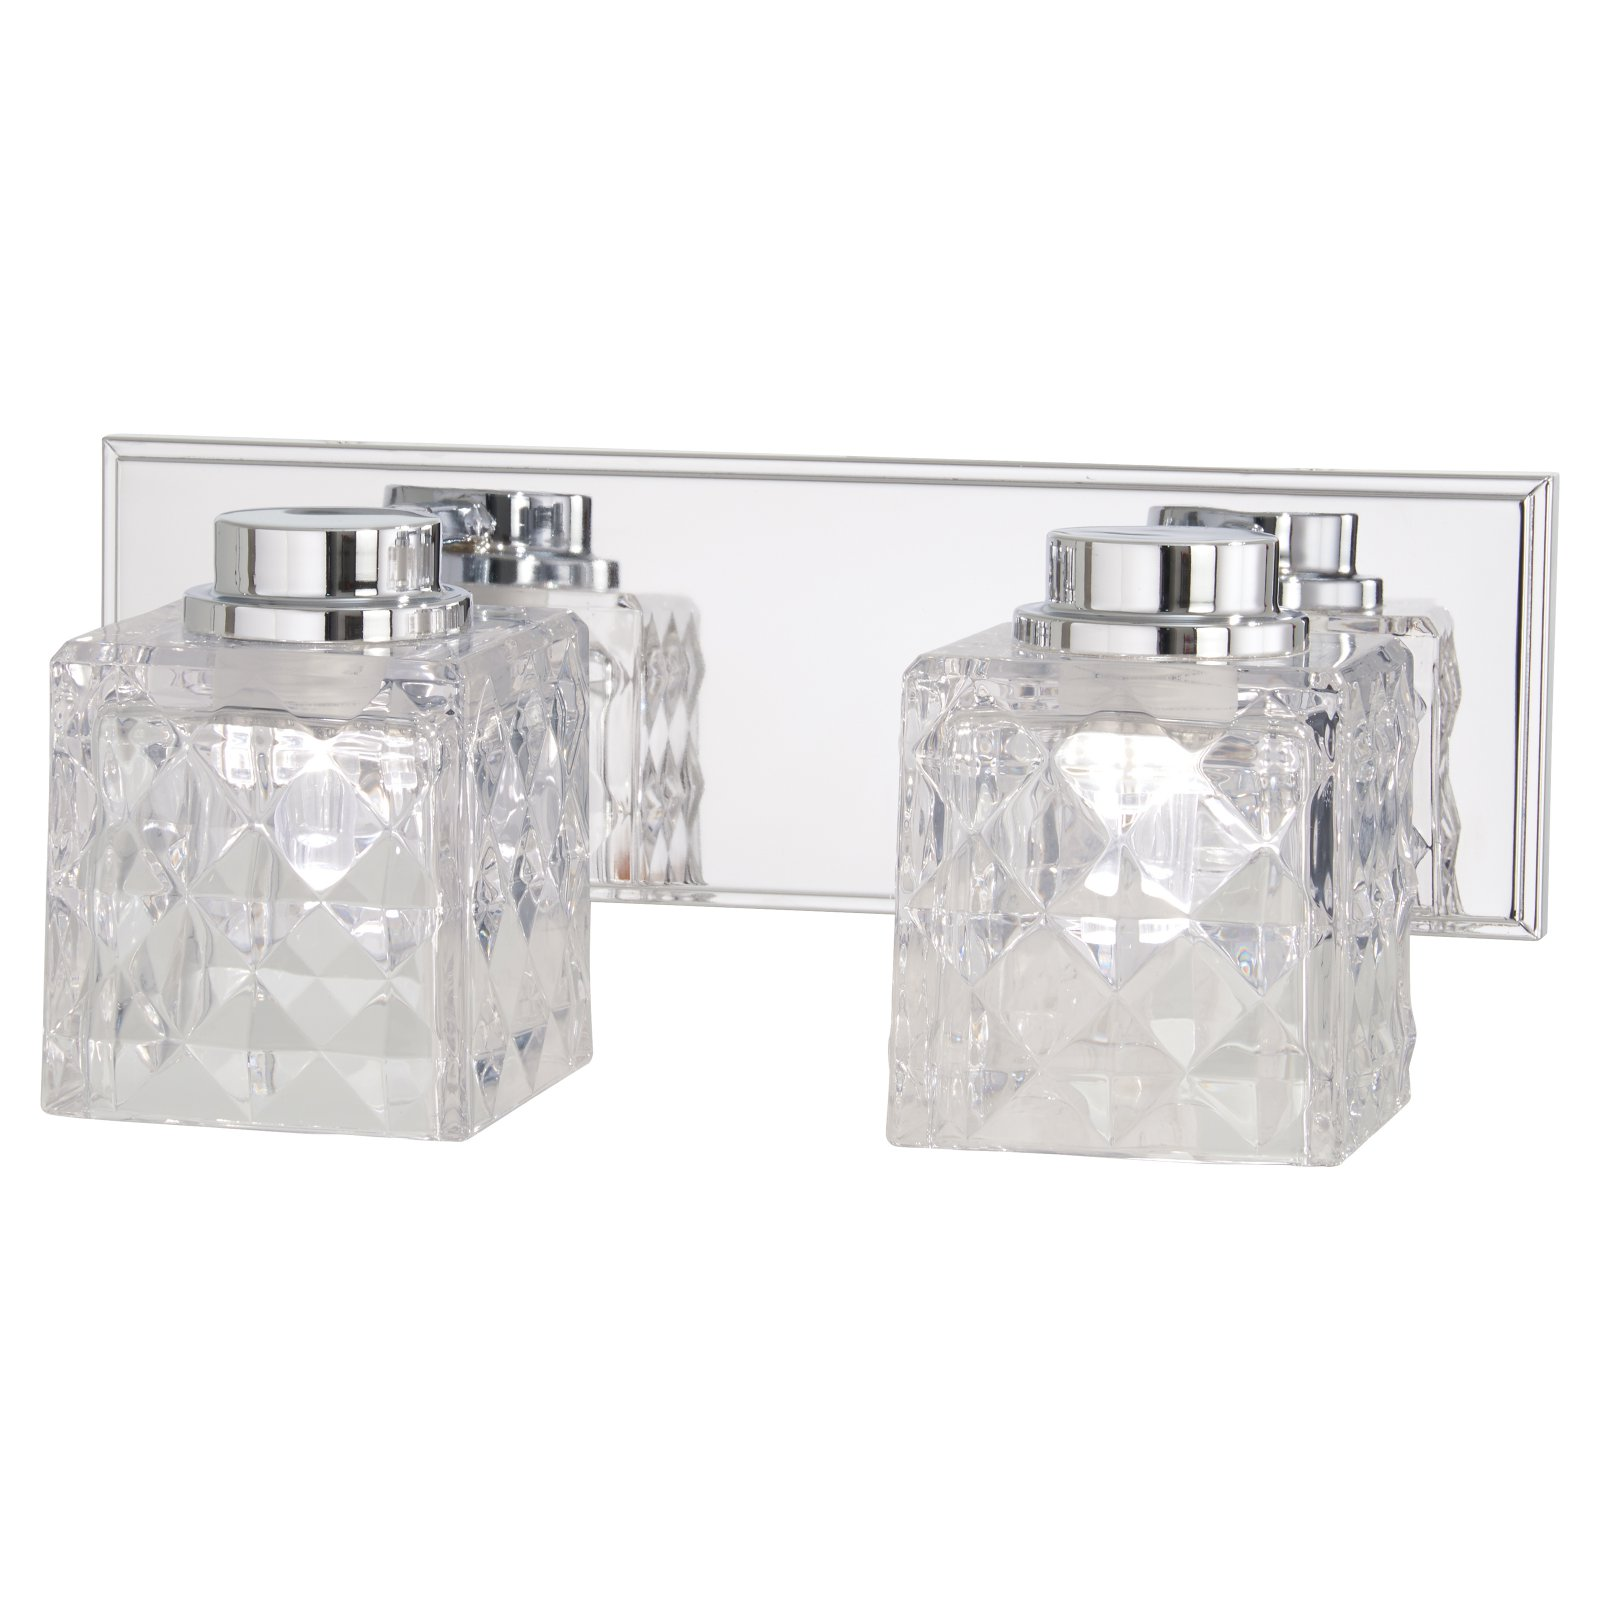 Minka Lavery Glorietta 4792-77-L 2 Light Bathroom Vanity Light